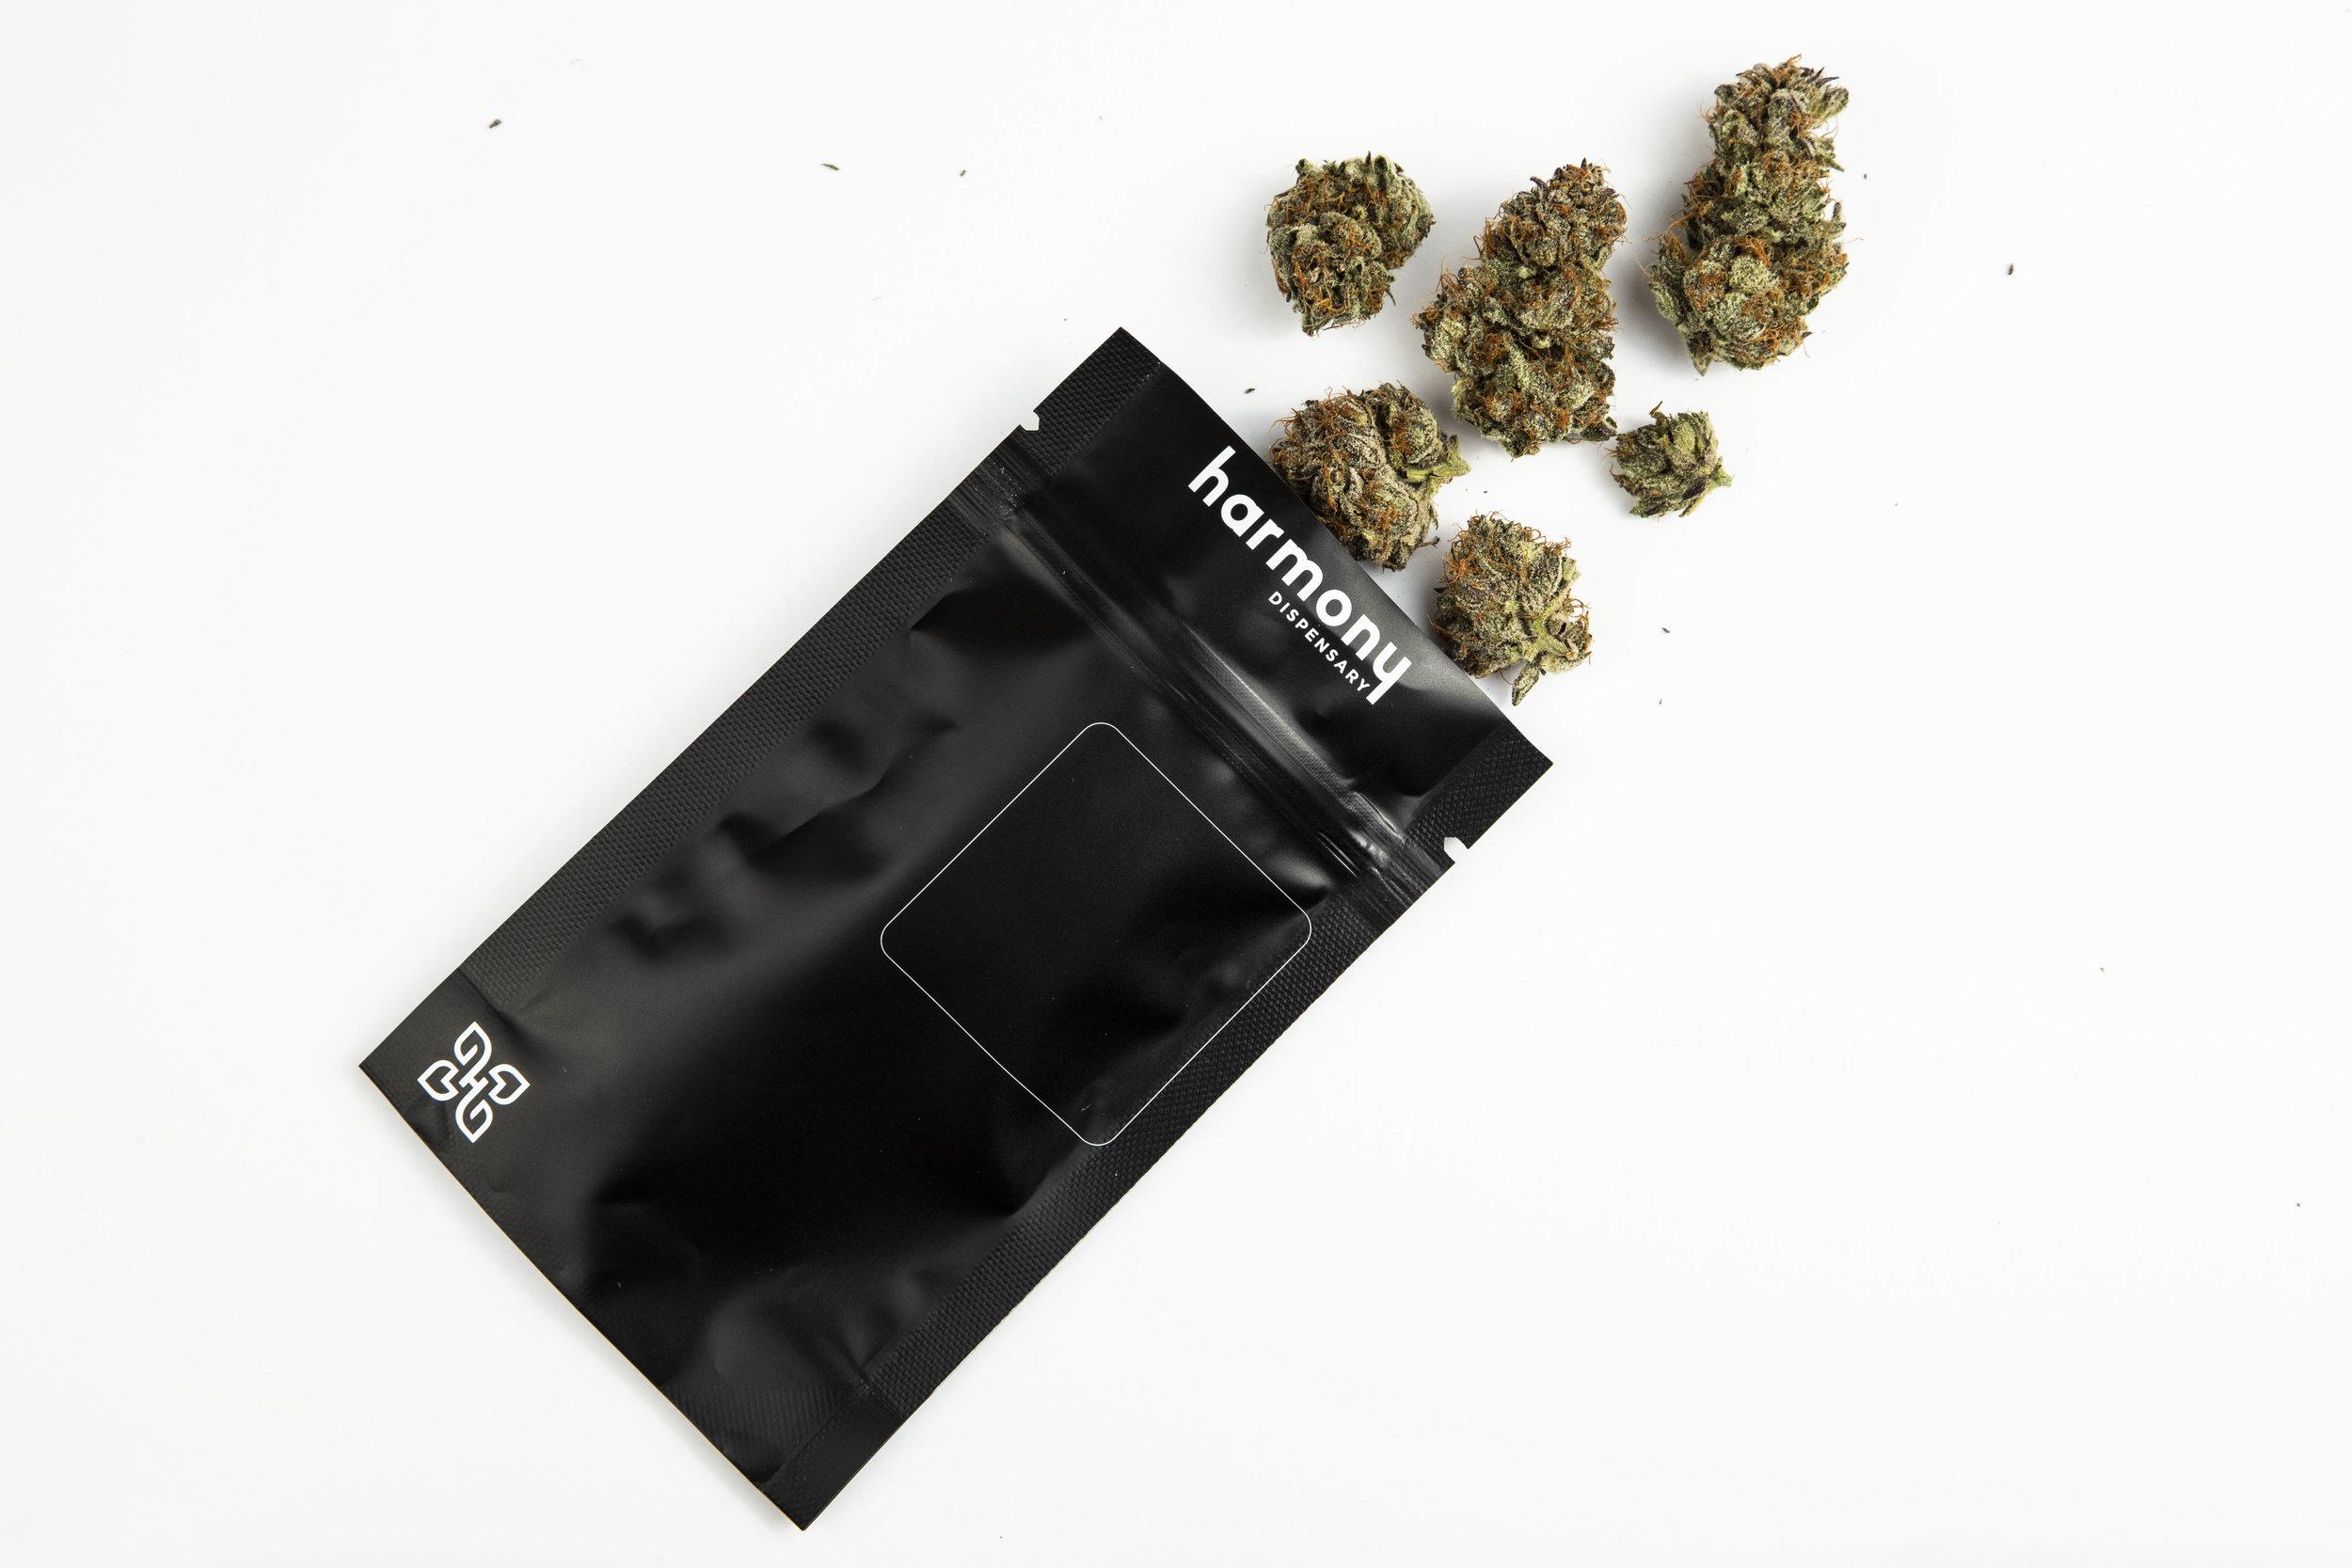 Black Bag - Premium Whole Flower